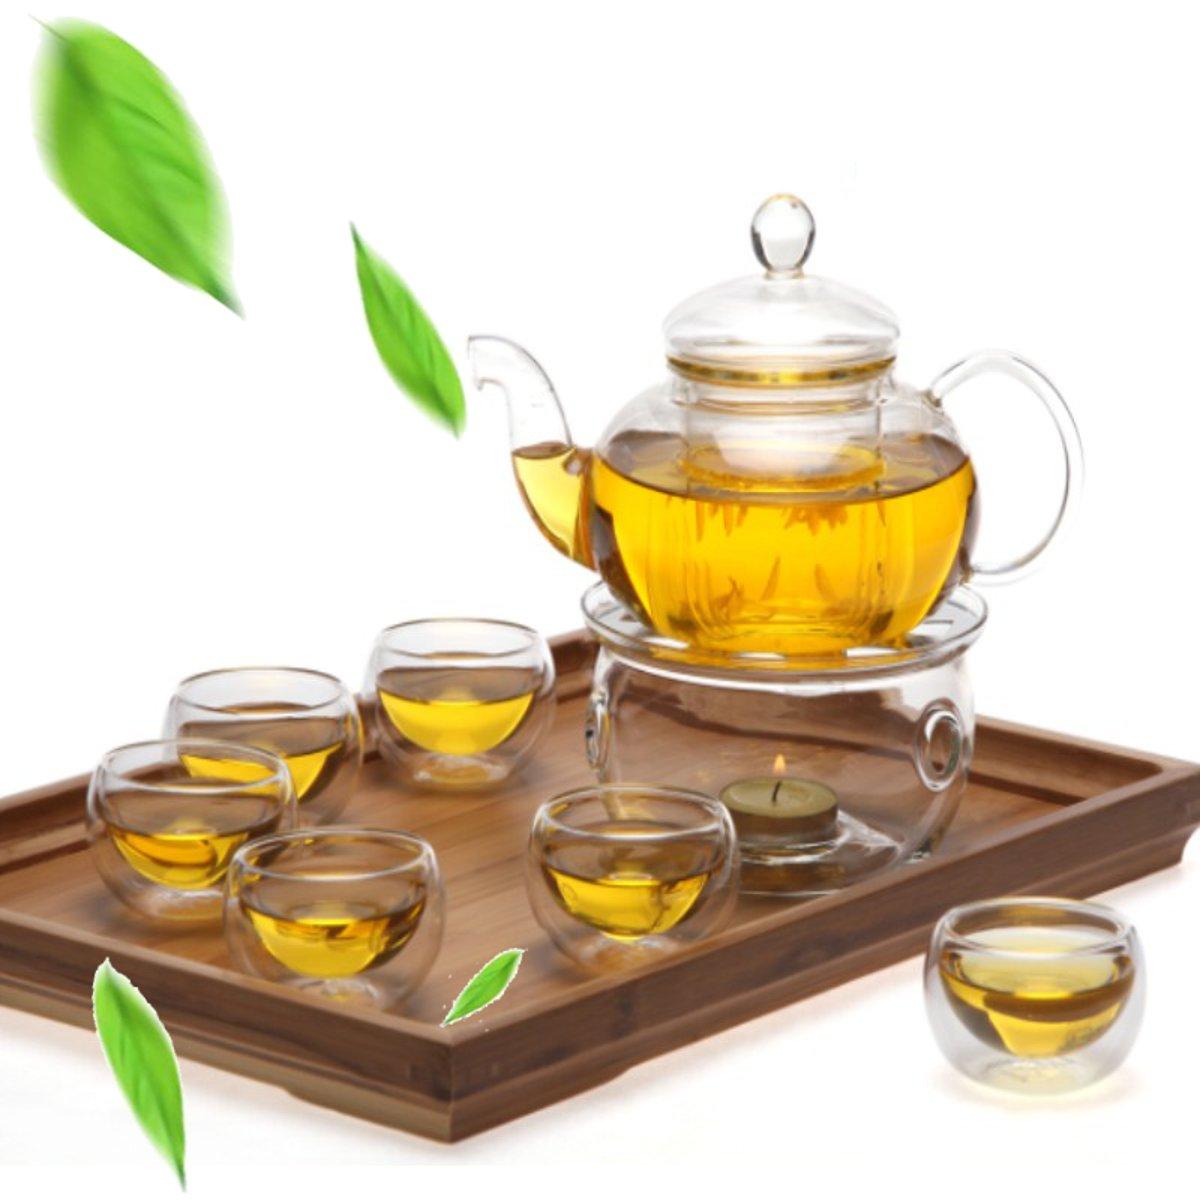 8 Pcs/Set Handmade Teapot Set Heat-Resisting Warmer Clear Glass Tea Pot Double Wall Teapot & Cup Filtering Drink Home Decor